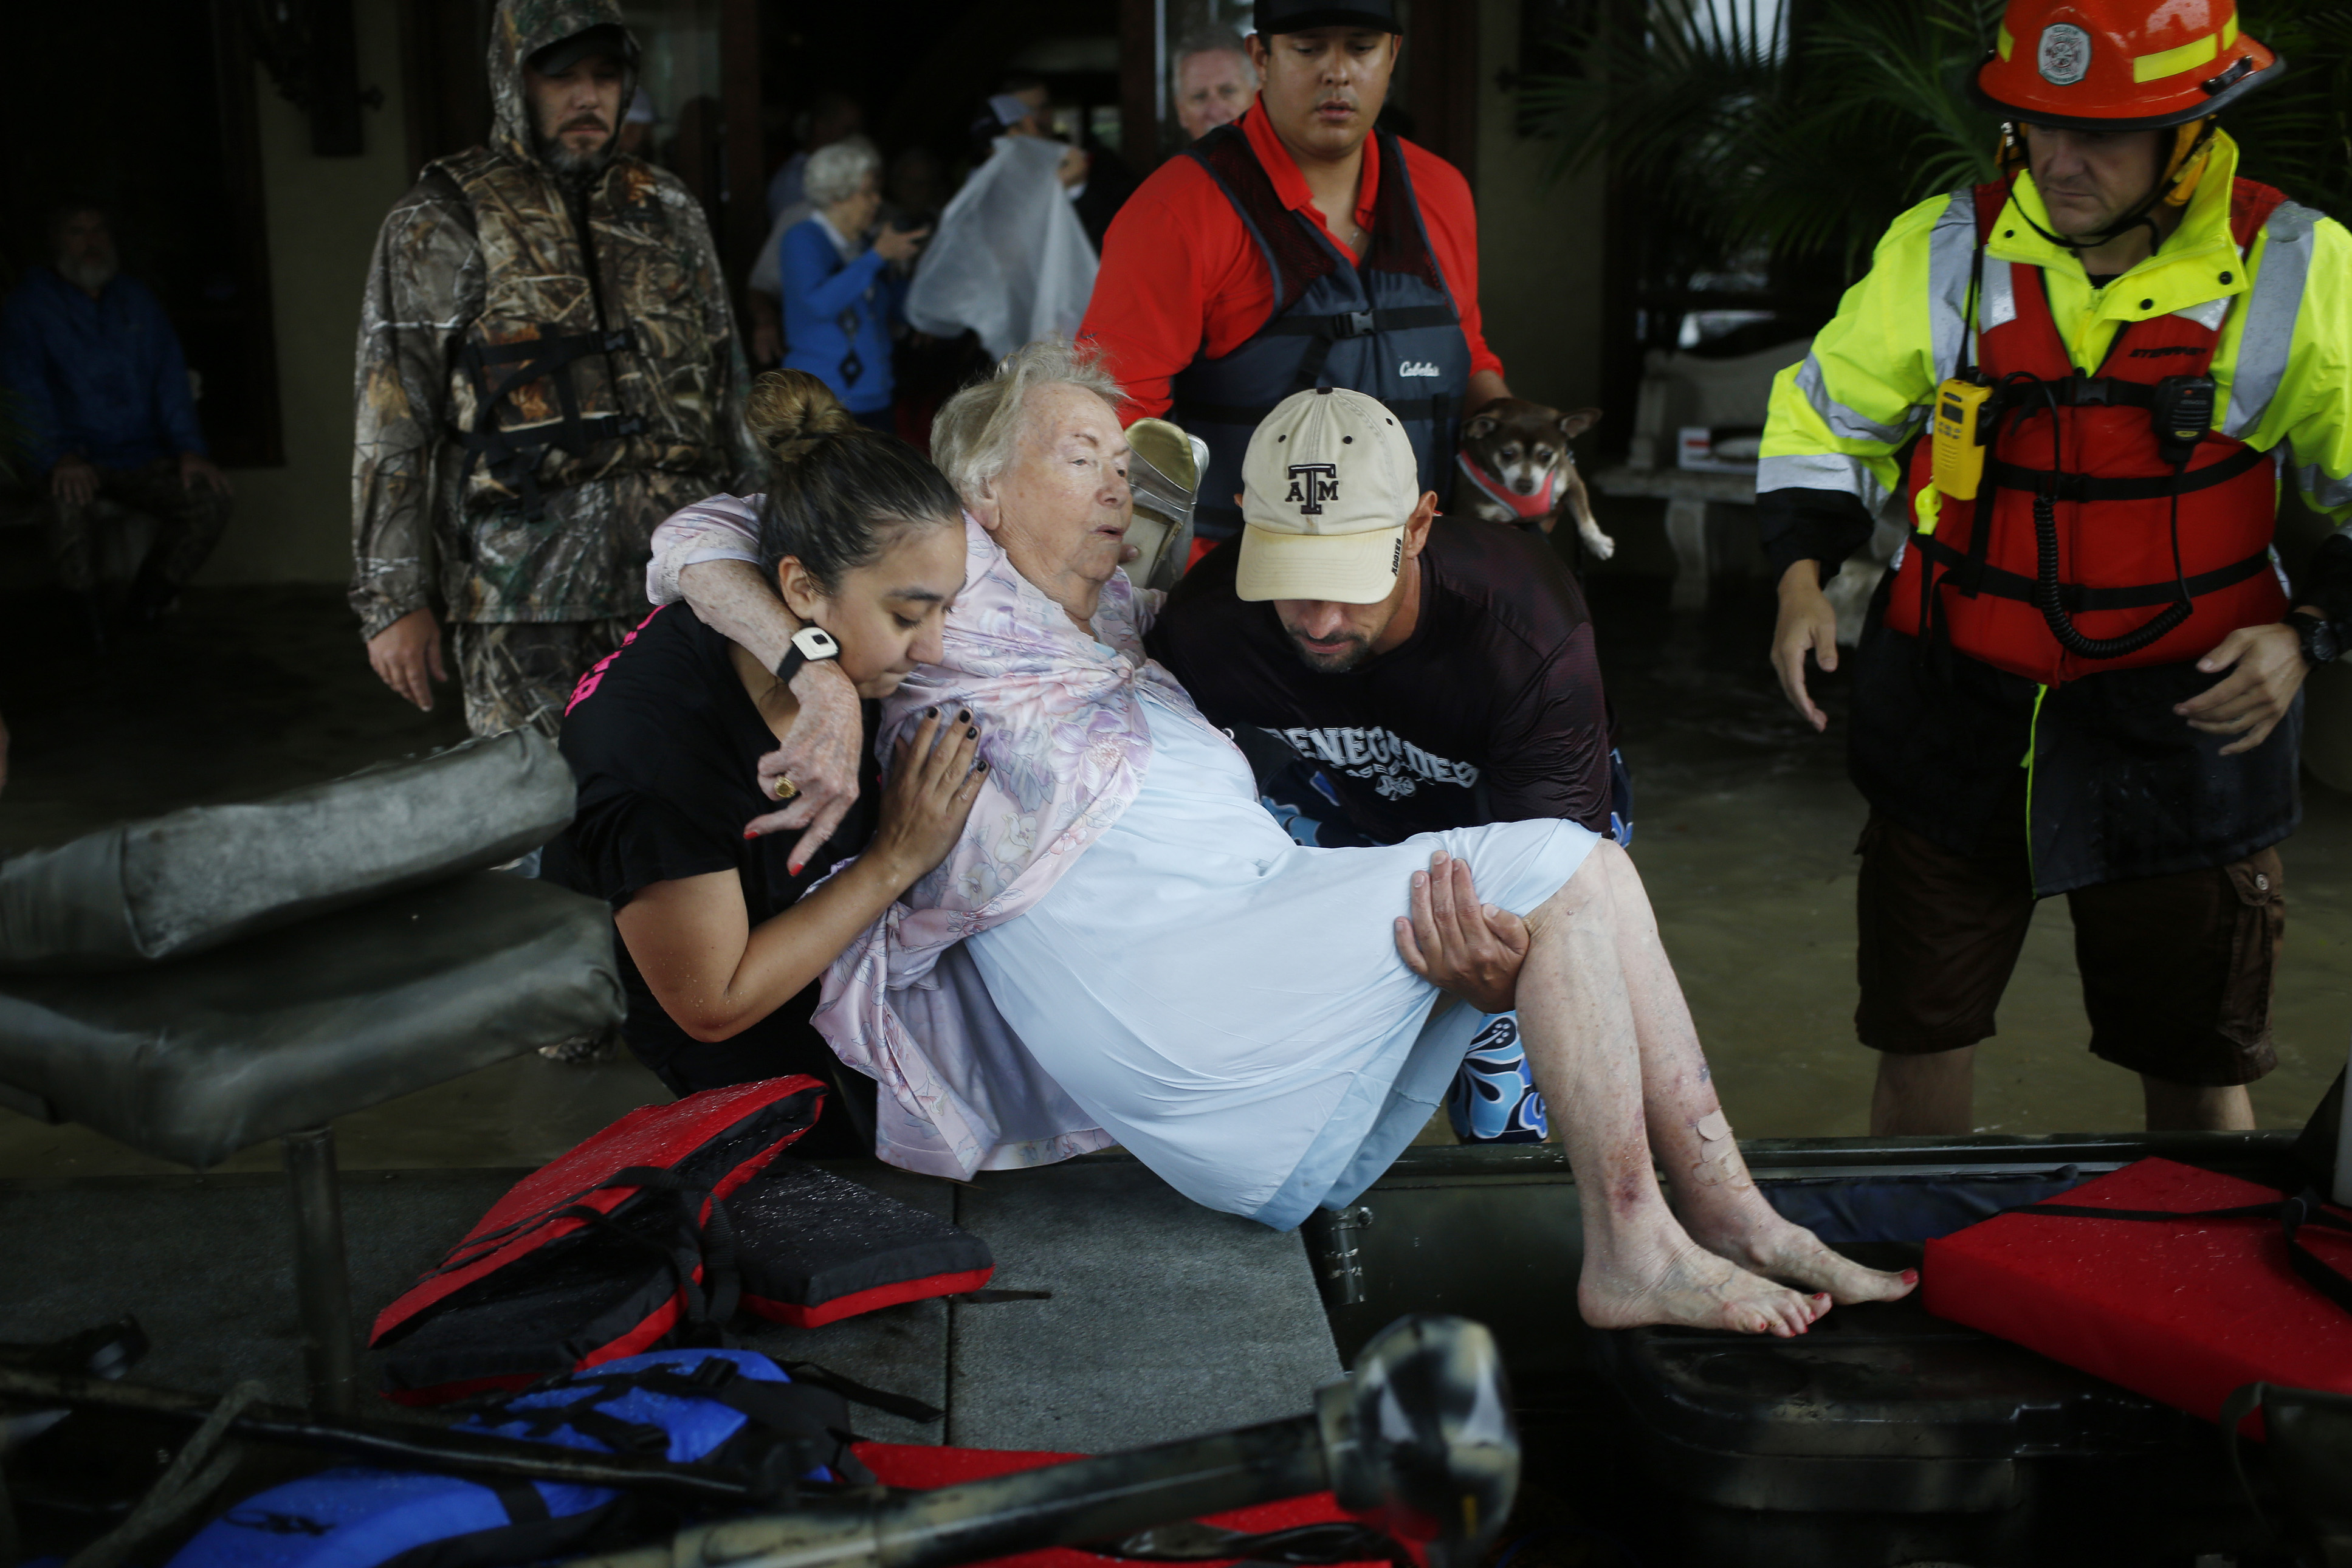 https://assets.sourcemedia.com/16/94/8a02fe7943e3824c23cdabfa273d/houston-retirementhome-flood-crop-2.jpg